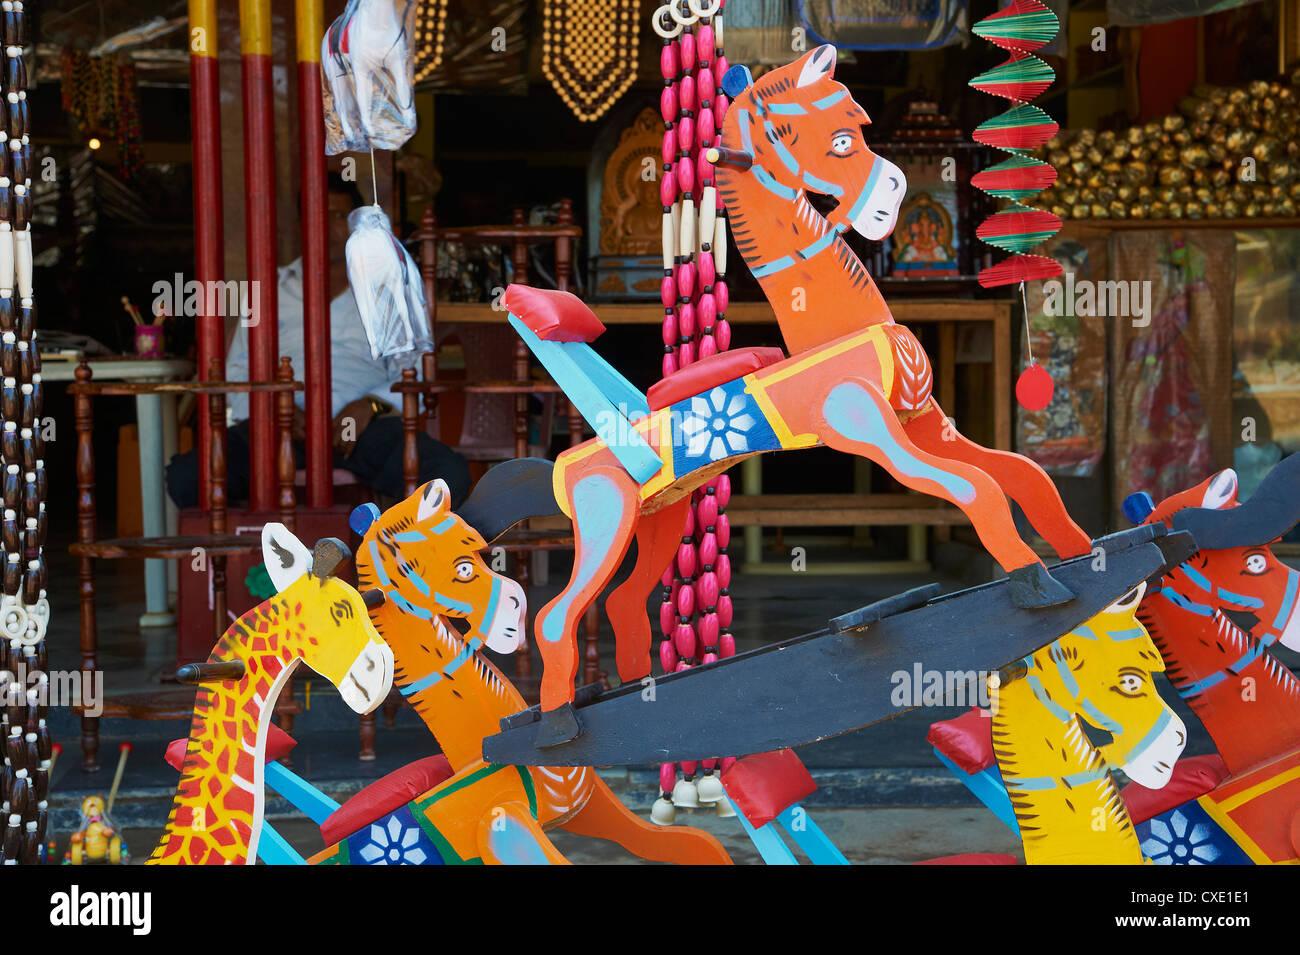 Channapatna Dorf, berühmt für Holzspielzeug, Mysore, Karnataka, Indien, Asien Stockbild